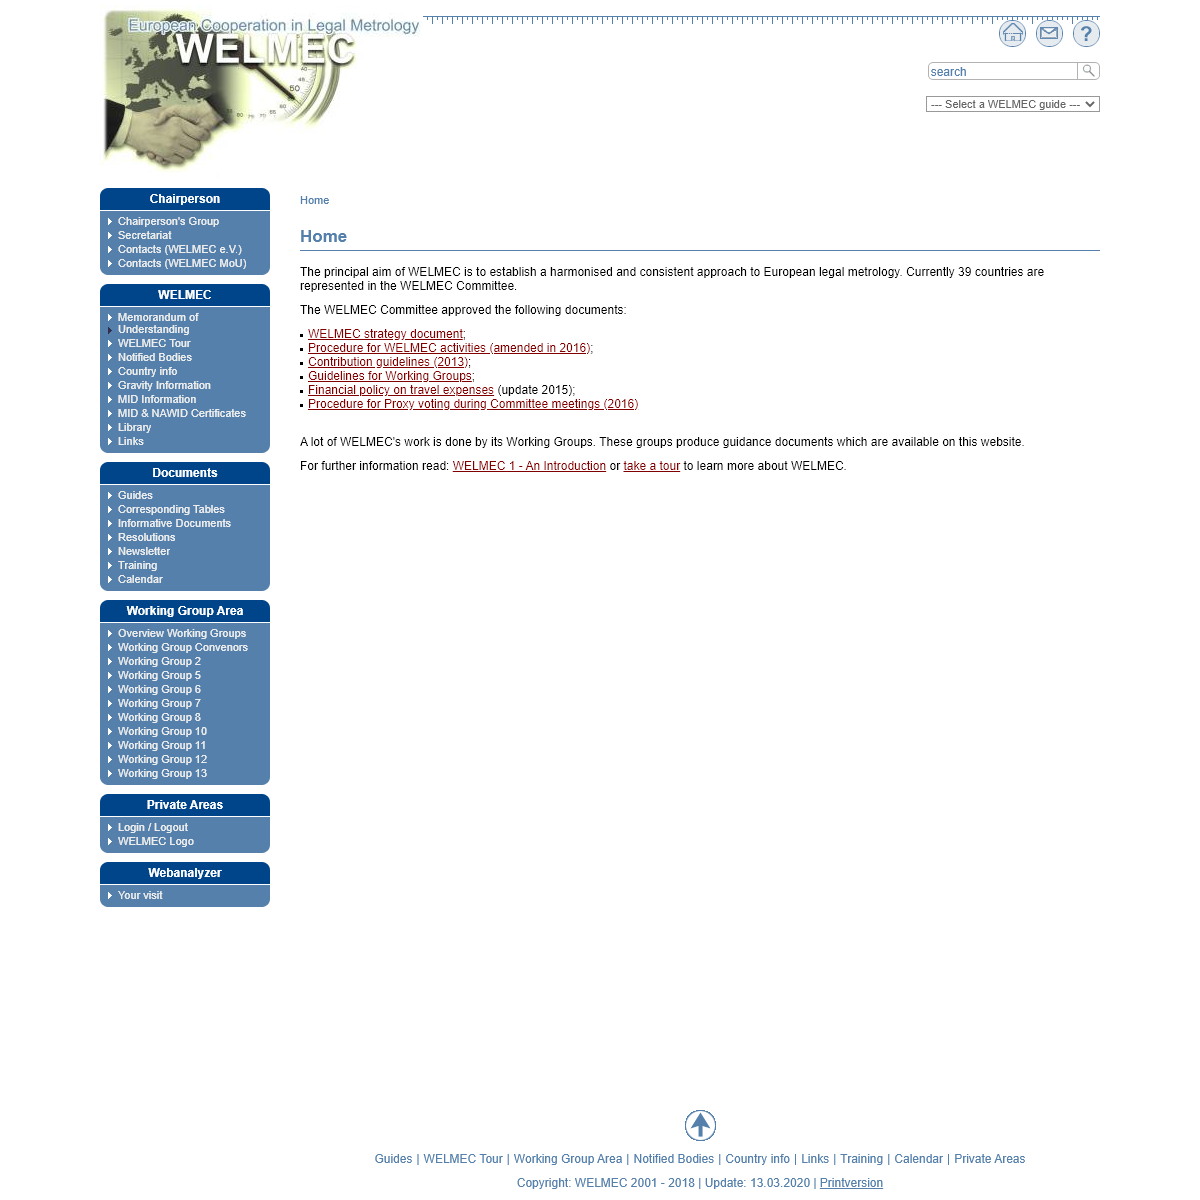 WELMEC - European Legal Metrology